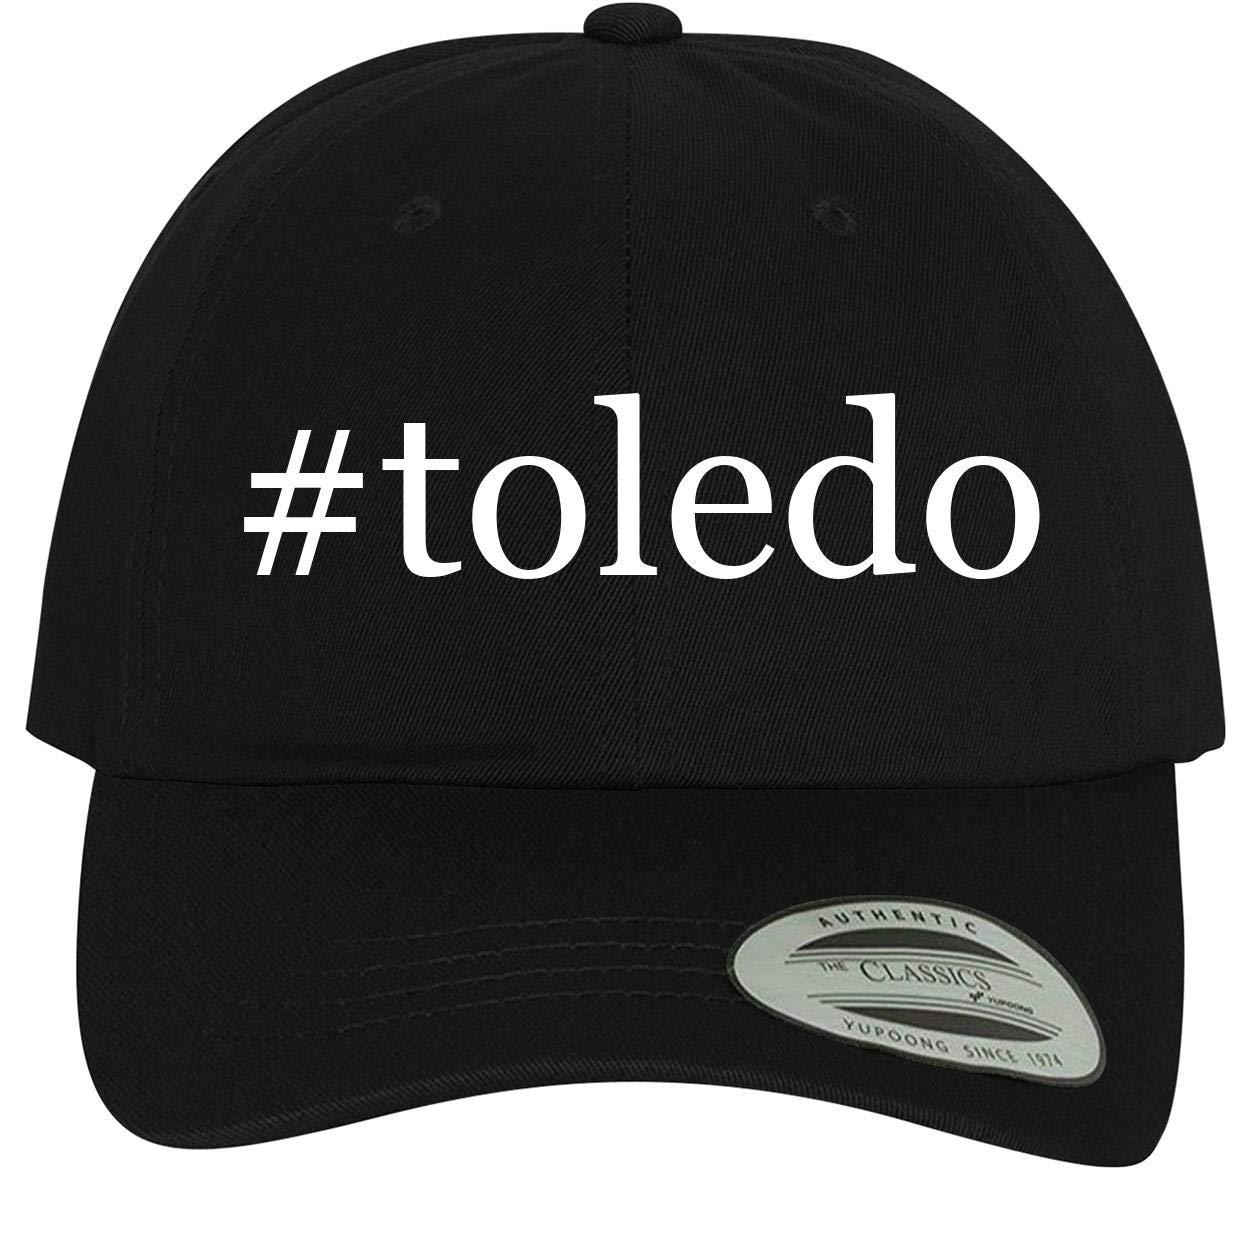 BH Cool Designs #Toledo Comfortable Dad Hat Baseball Cap